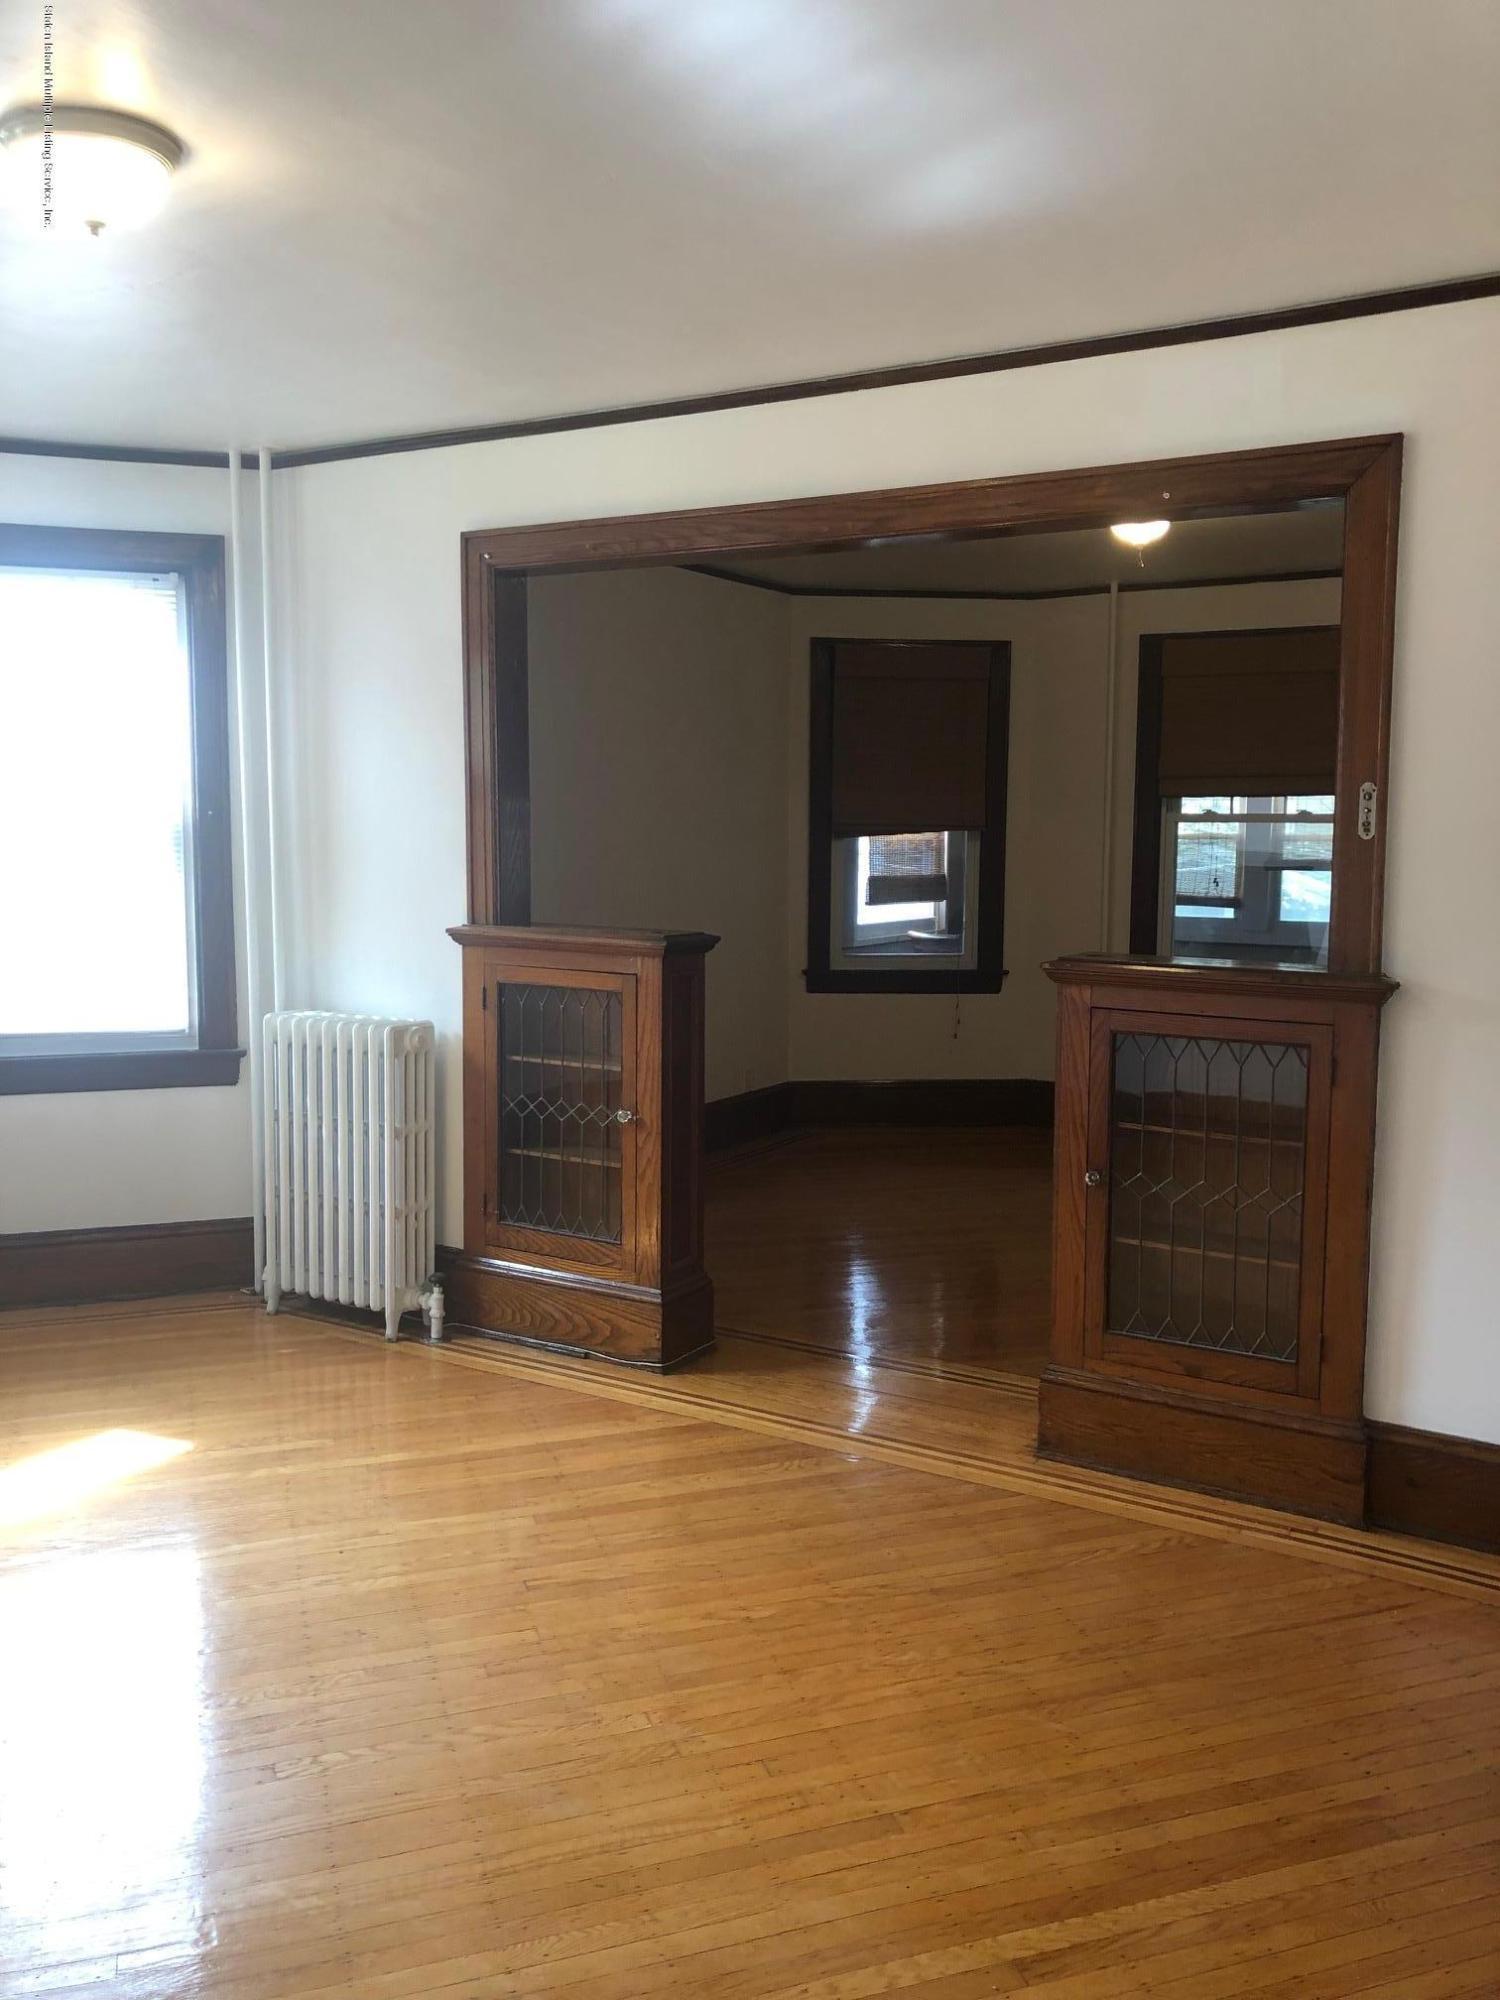 28 Crescent Avenue,Staten Island,New York,10301,United States,2 Bedrooms Bedrooms,6 Rooms Rooms,1 BathroomBathrooms,Res-Rental,Crescent,1128527